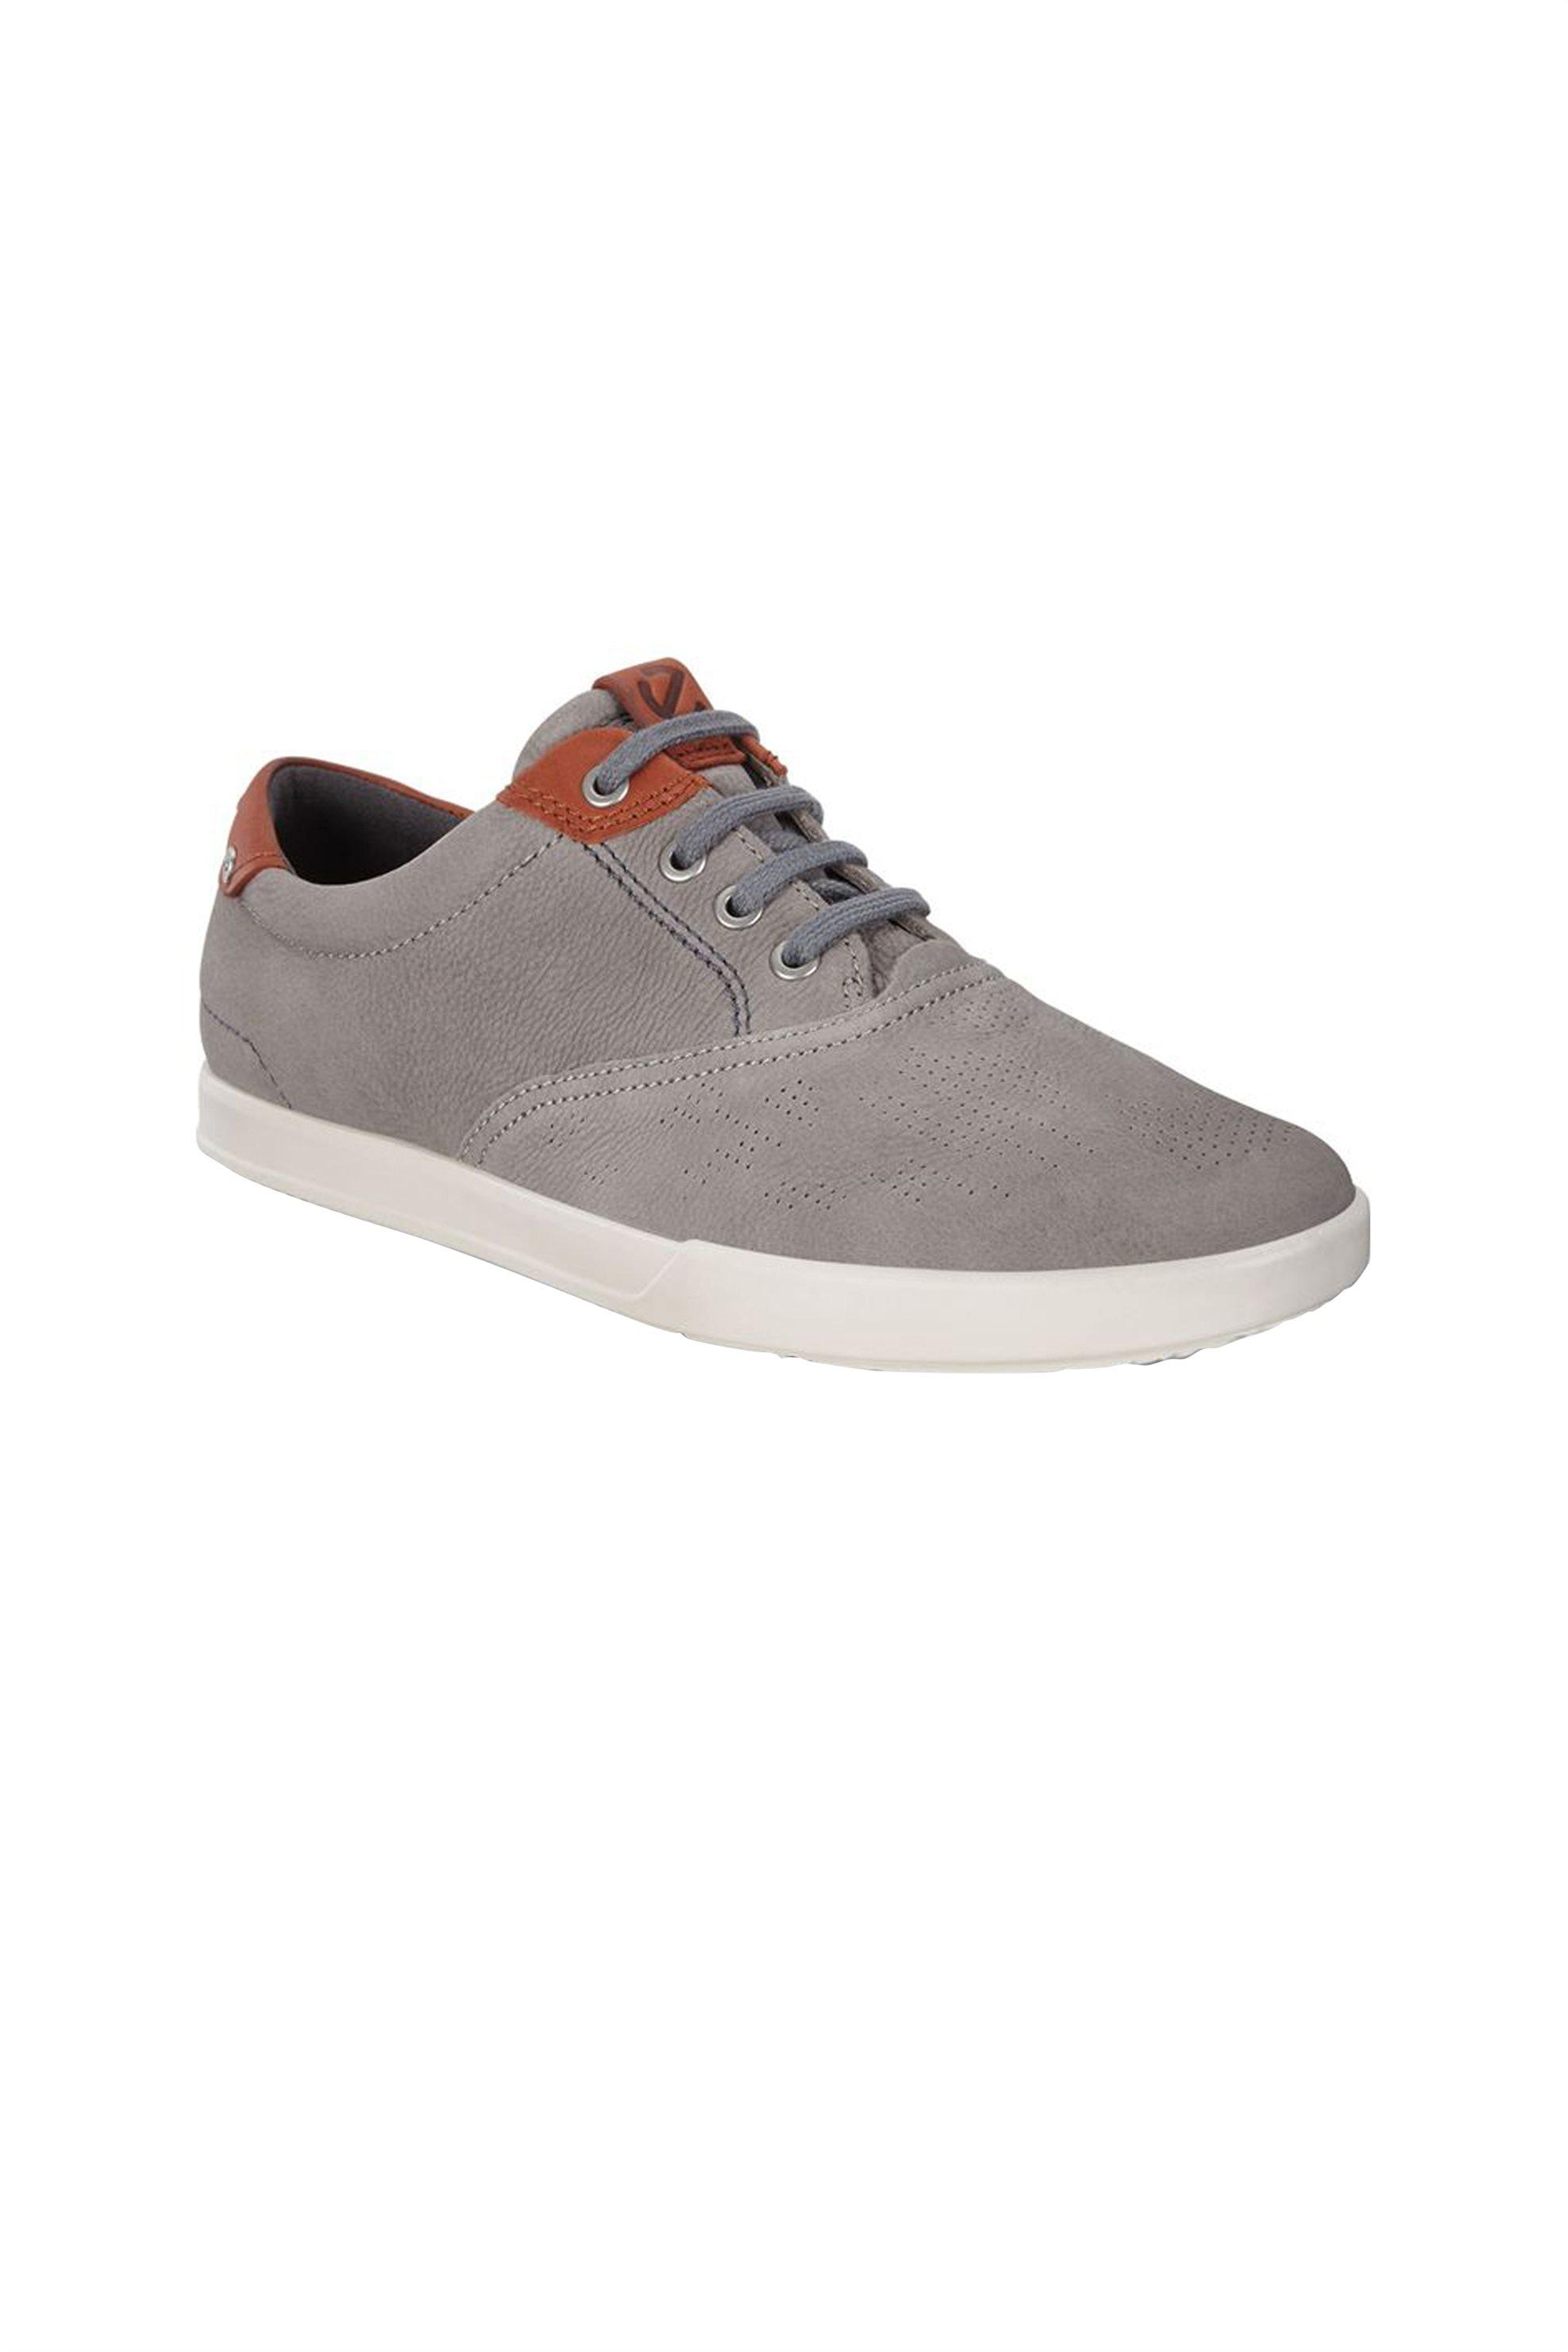 ECCO ανδρικά δερμάτινα sneakers Collin 2.0 suede – 536224 – Γκρι